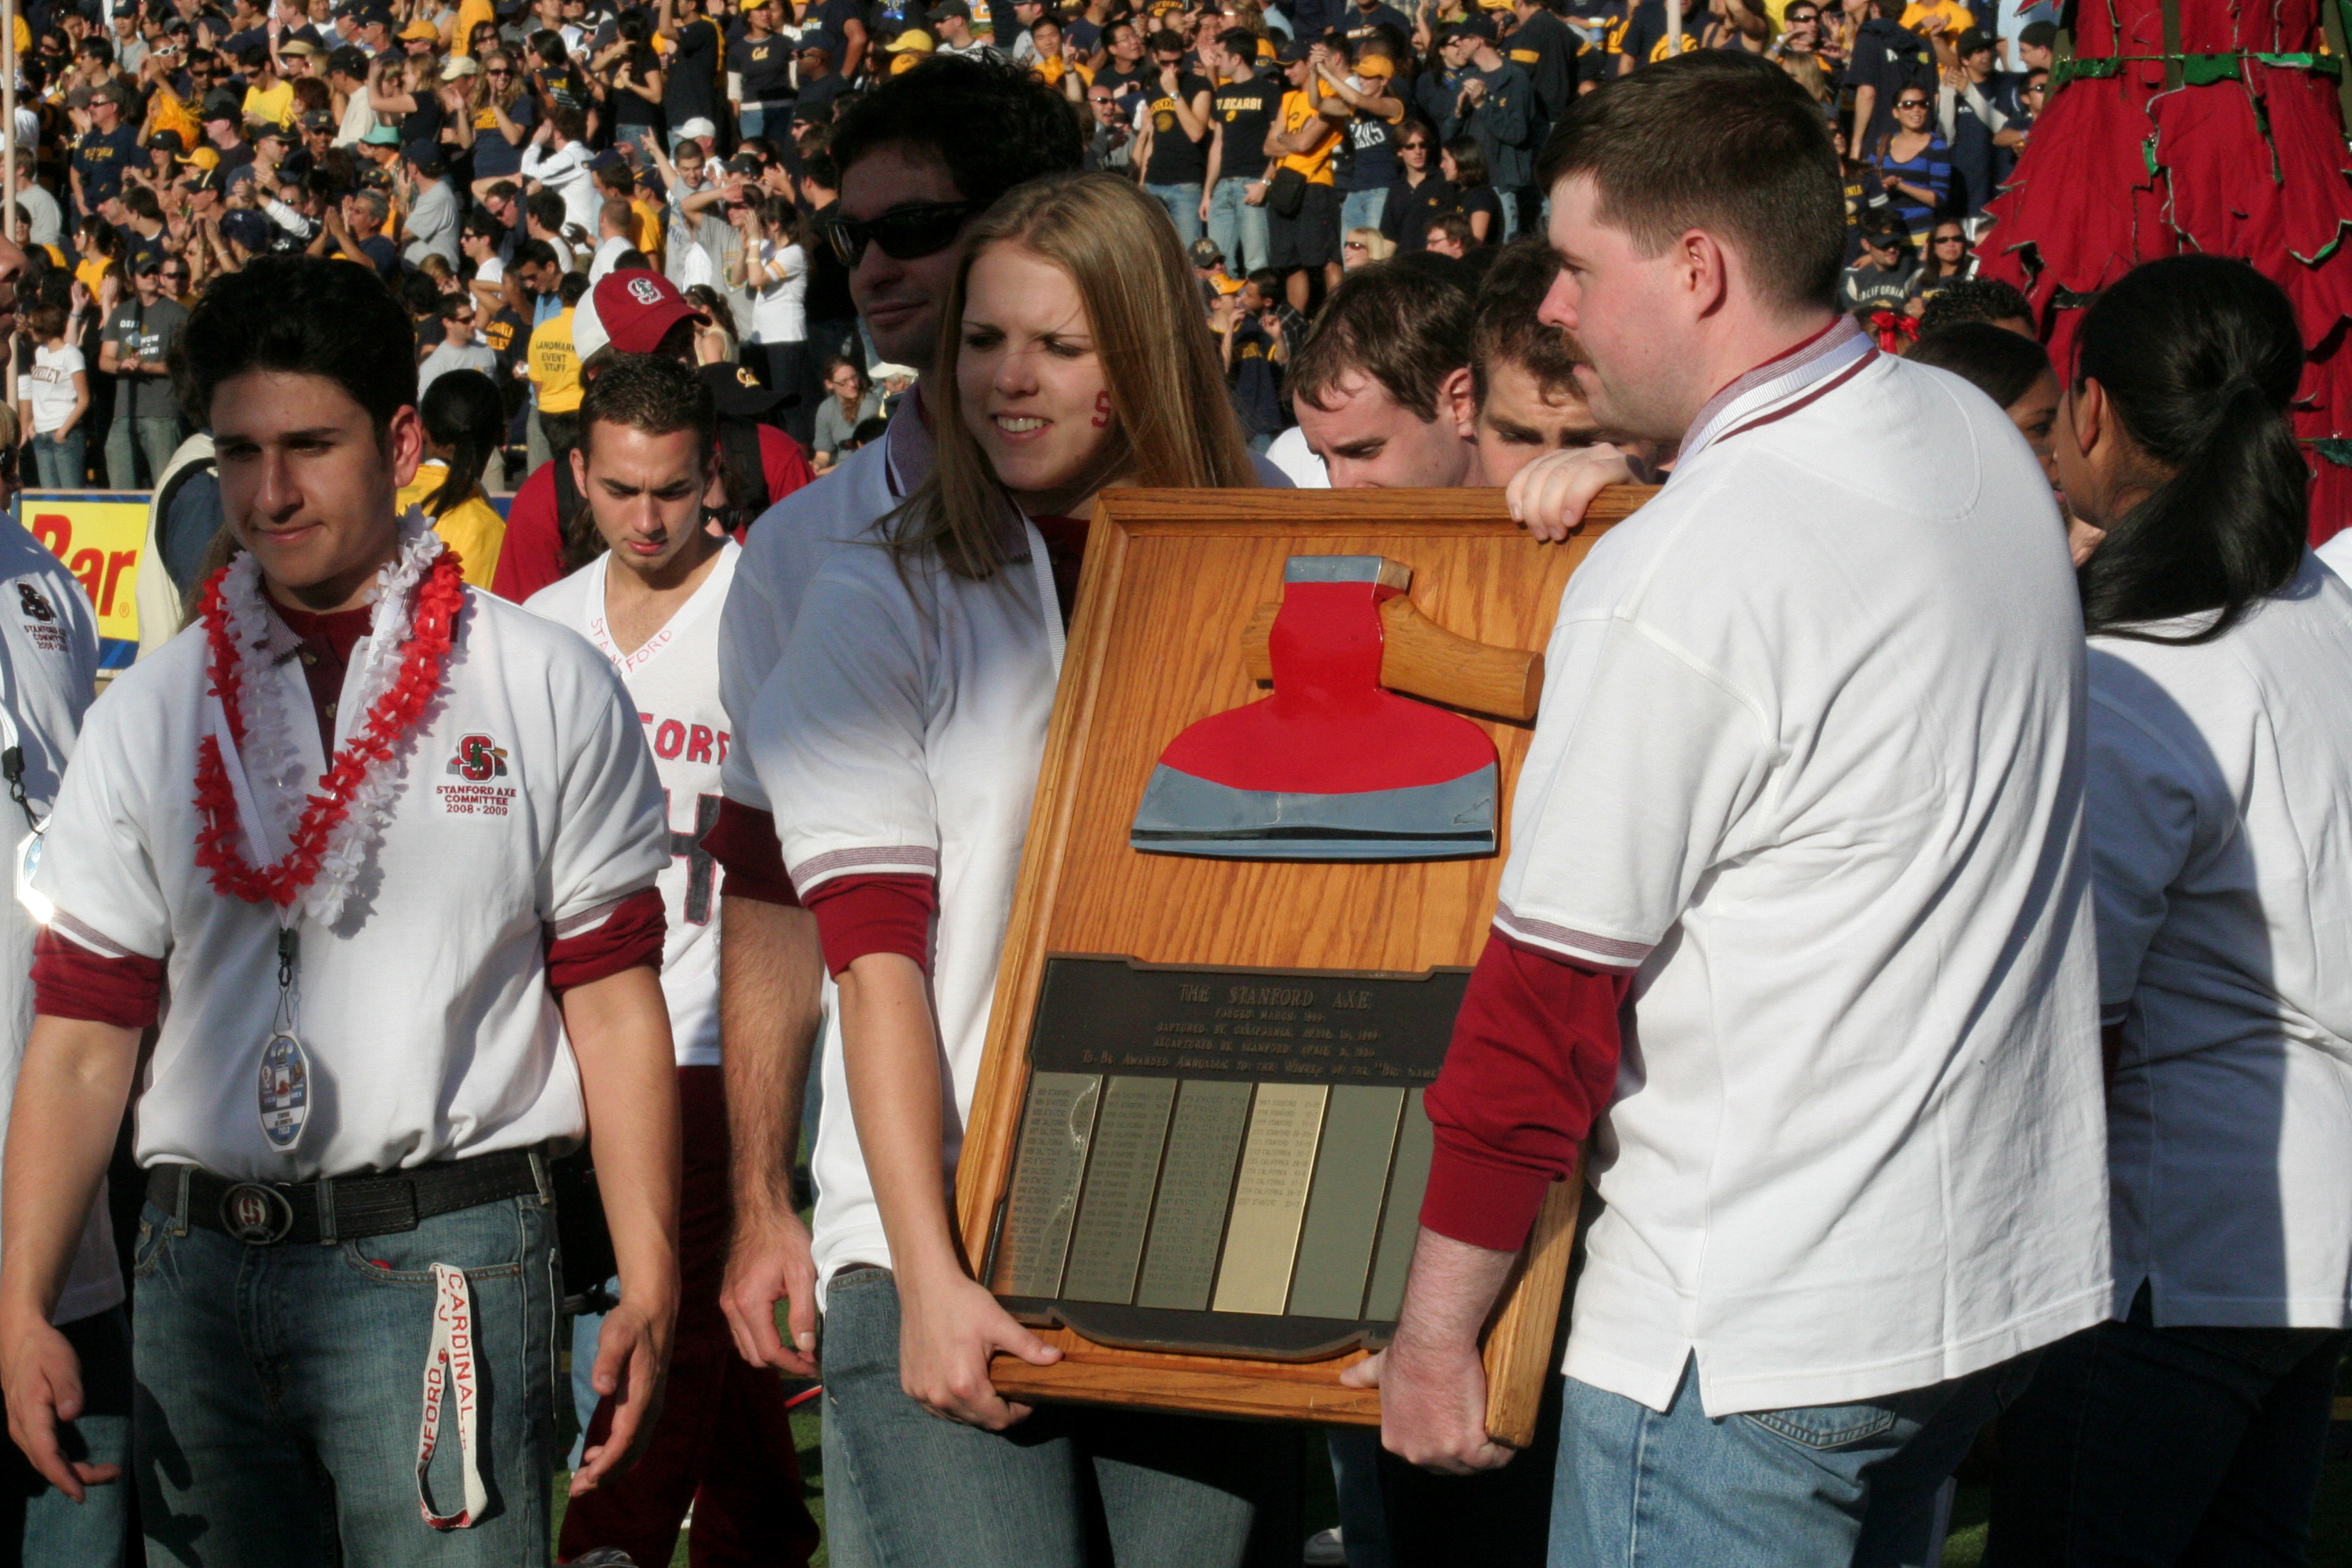 Stanford University's Axe Committee carries the Axe around Memorial Stadium.